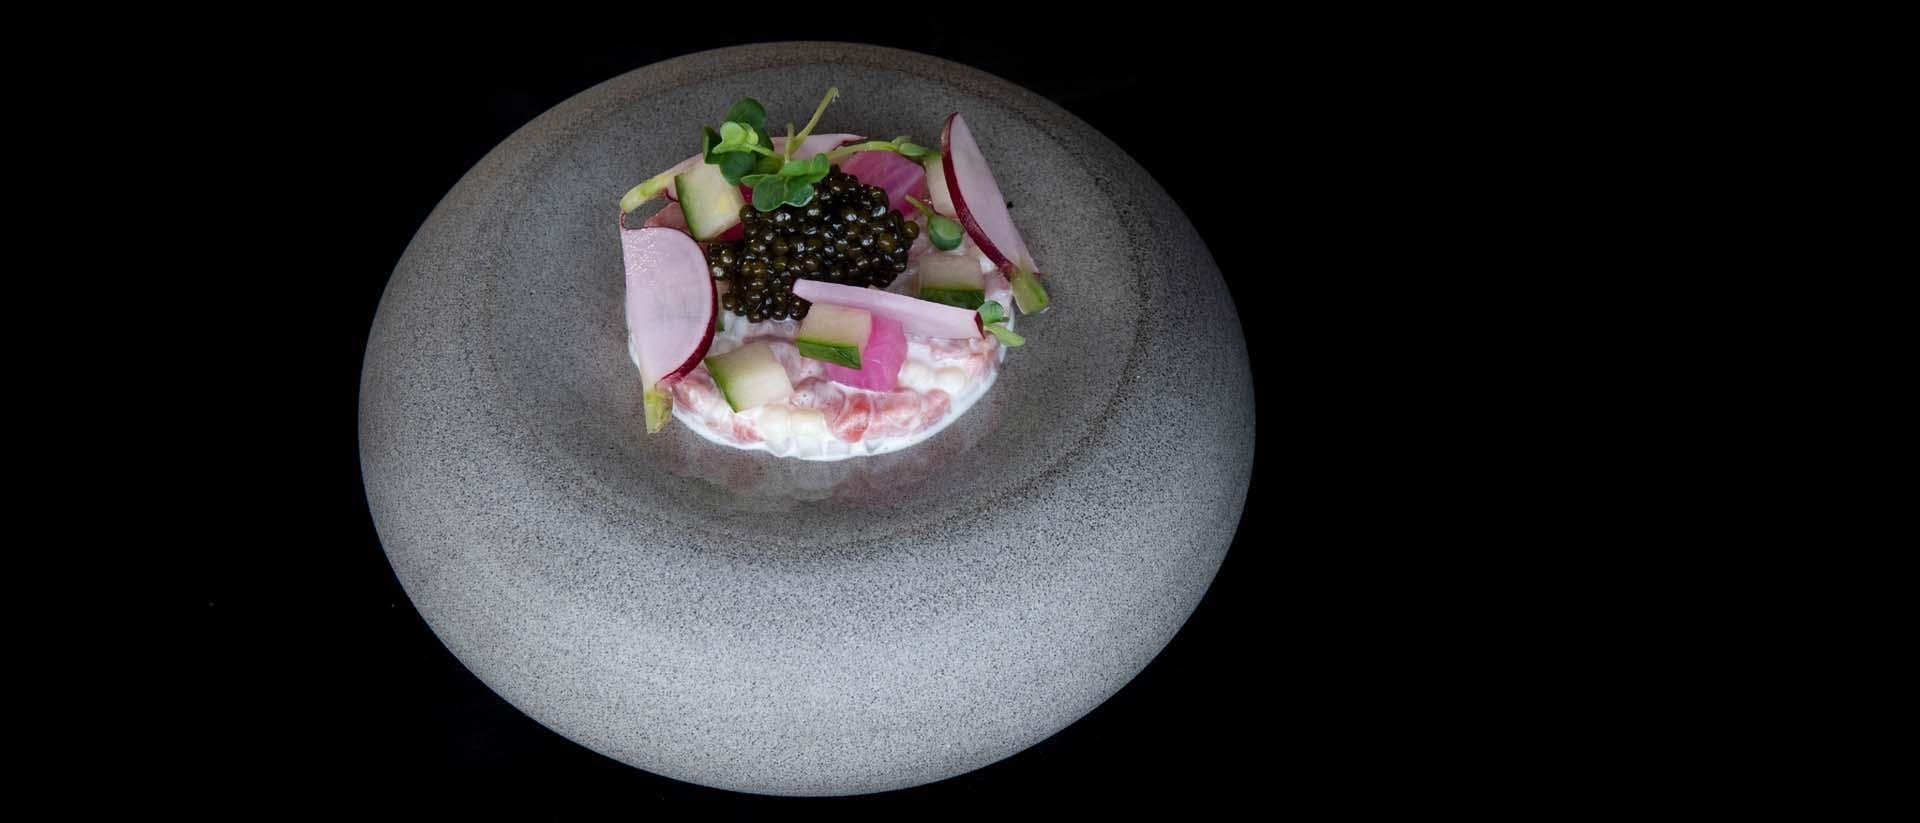 A salad on a stone dish